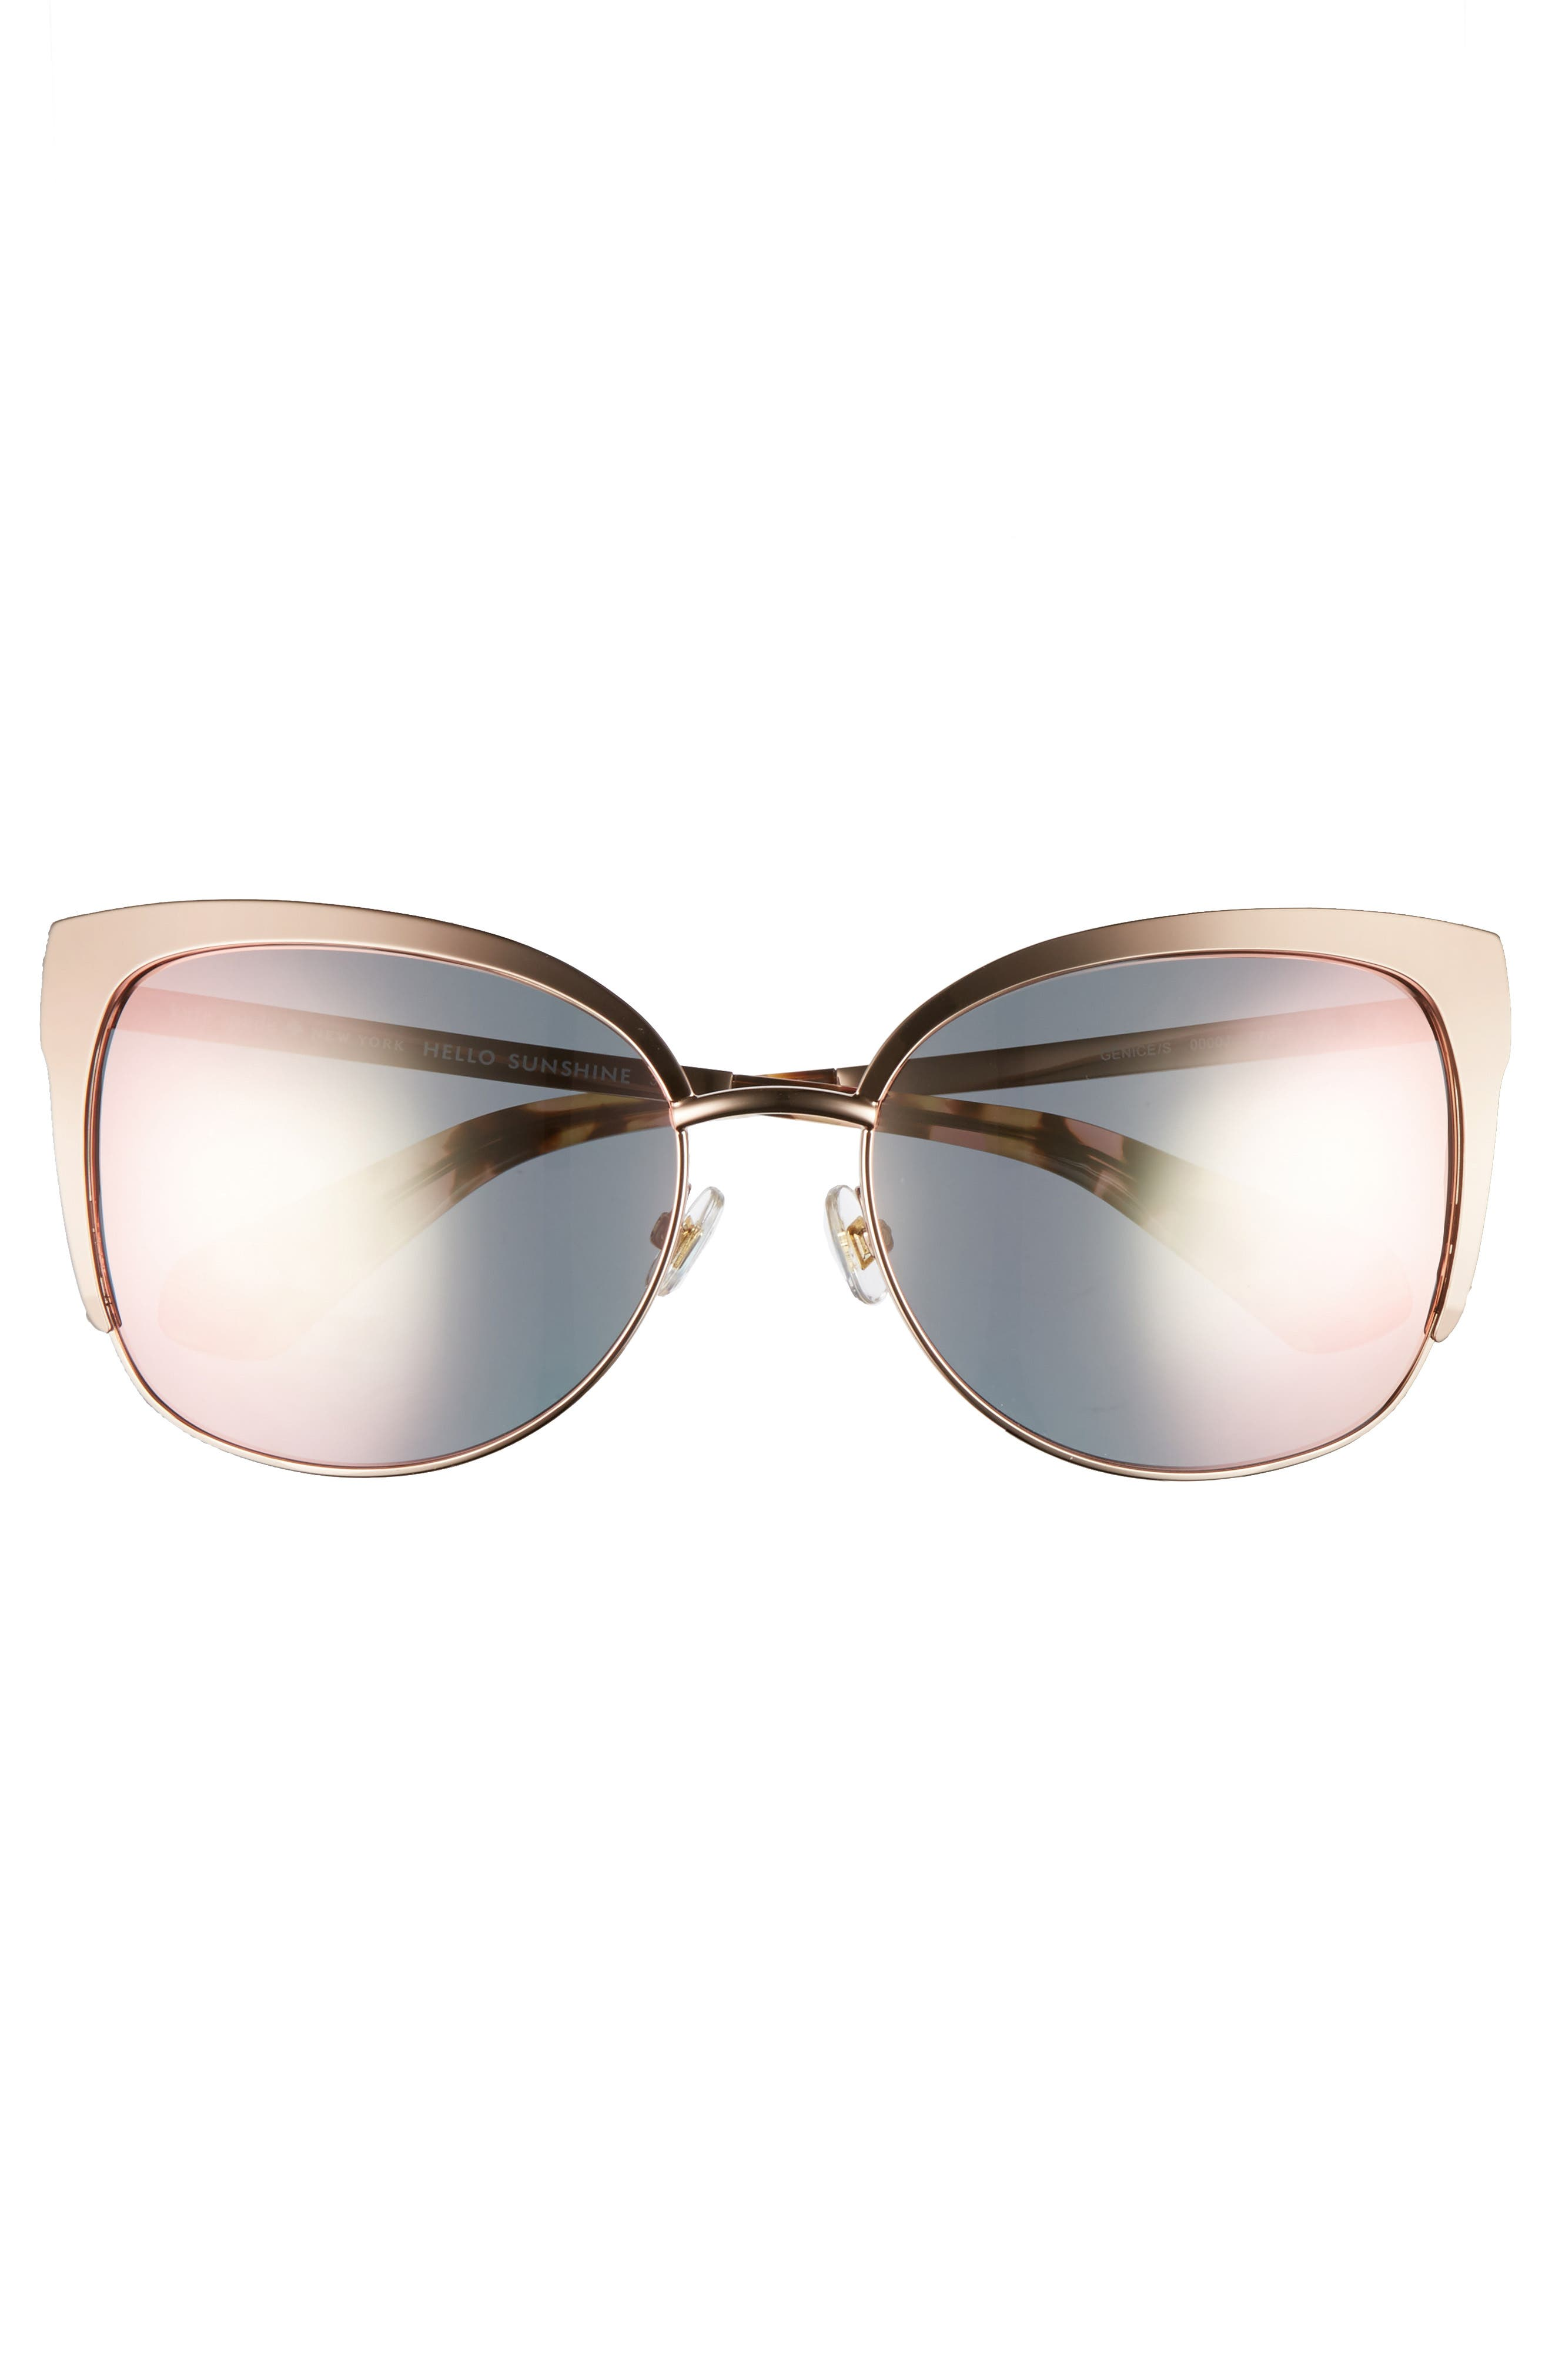 KATE SPADE NEW YORK, 'genice' 57mm cat-eye sunglasses, Alternate thumbnail 3, color, 710